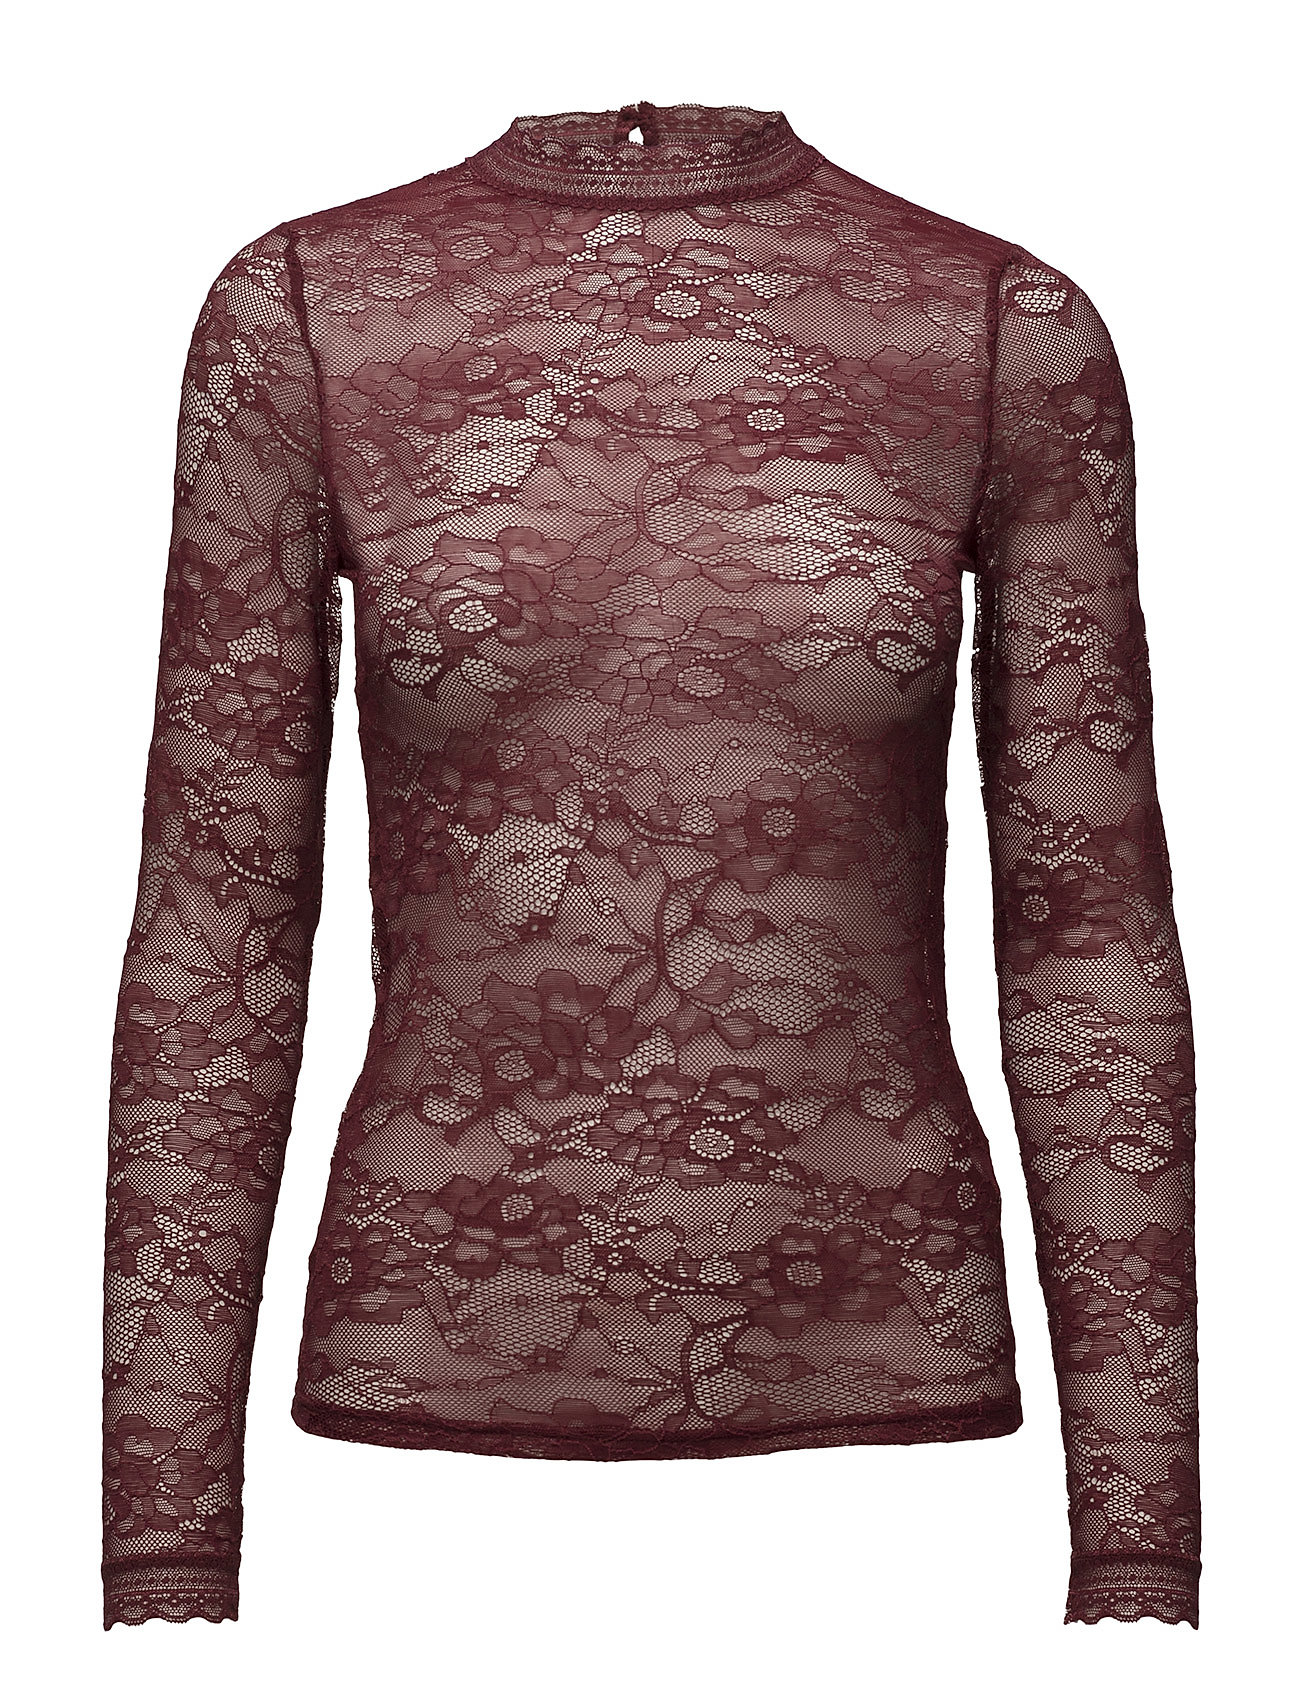 Rosemunde T-shirt regular ls w/lace - CABERNET